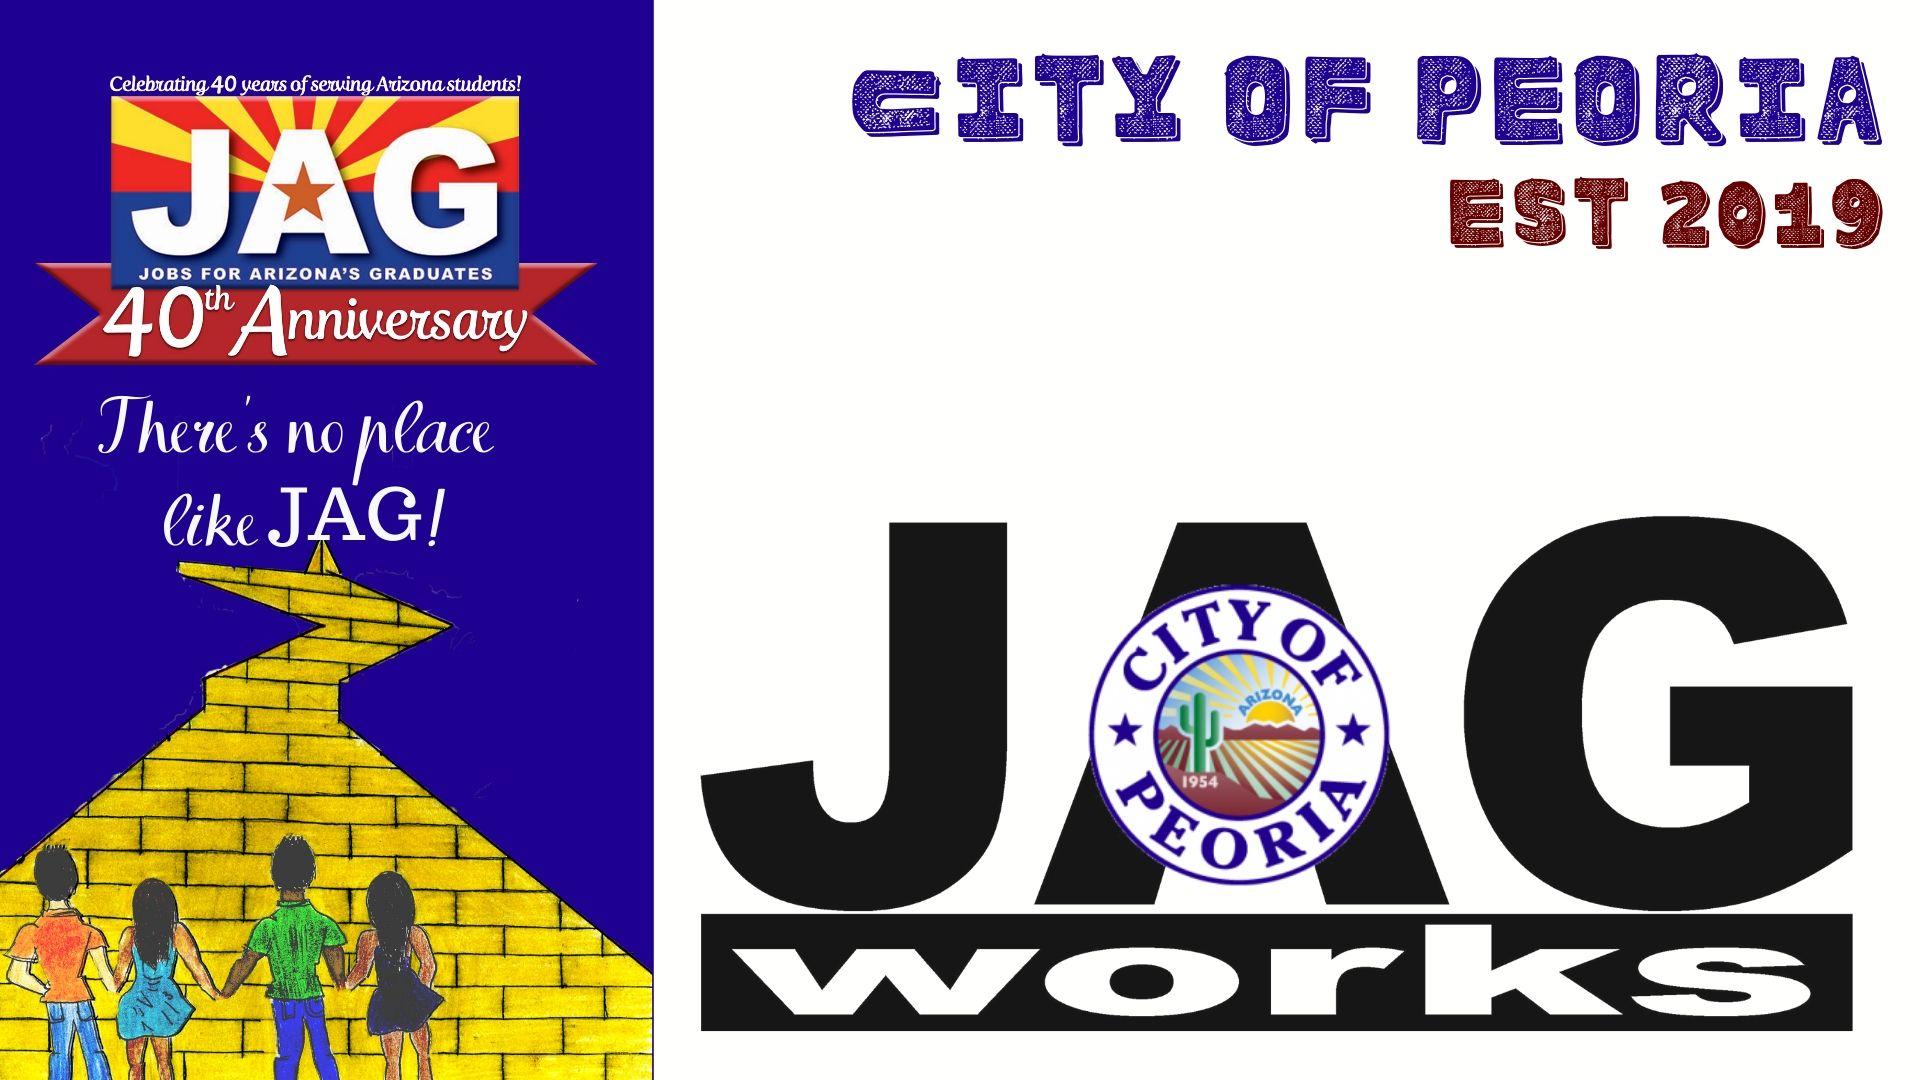 Peoria JAG Works